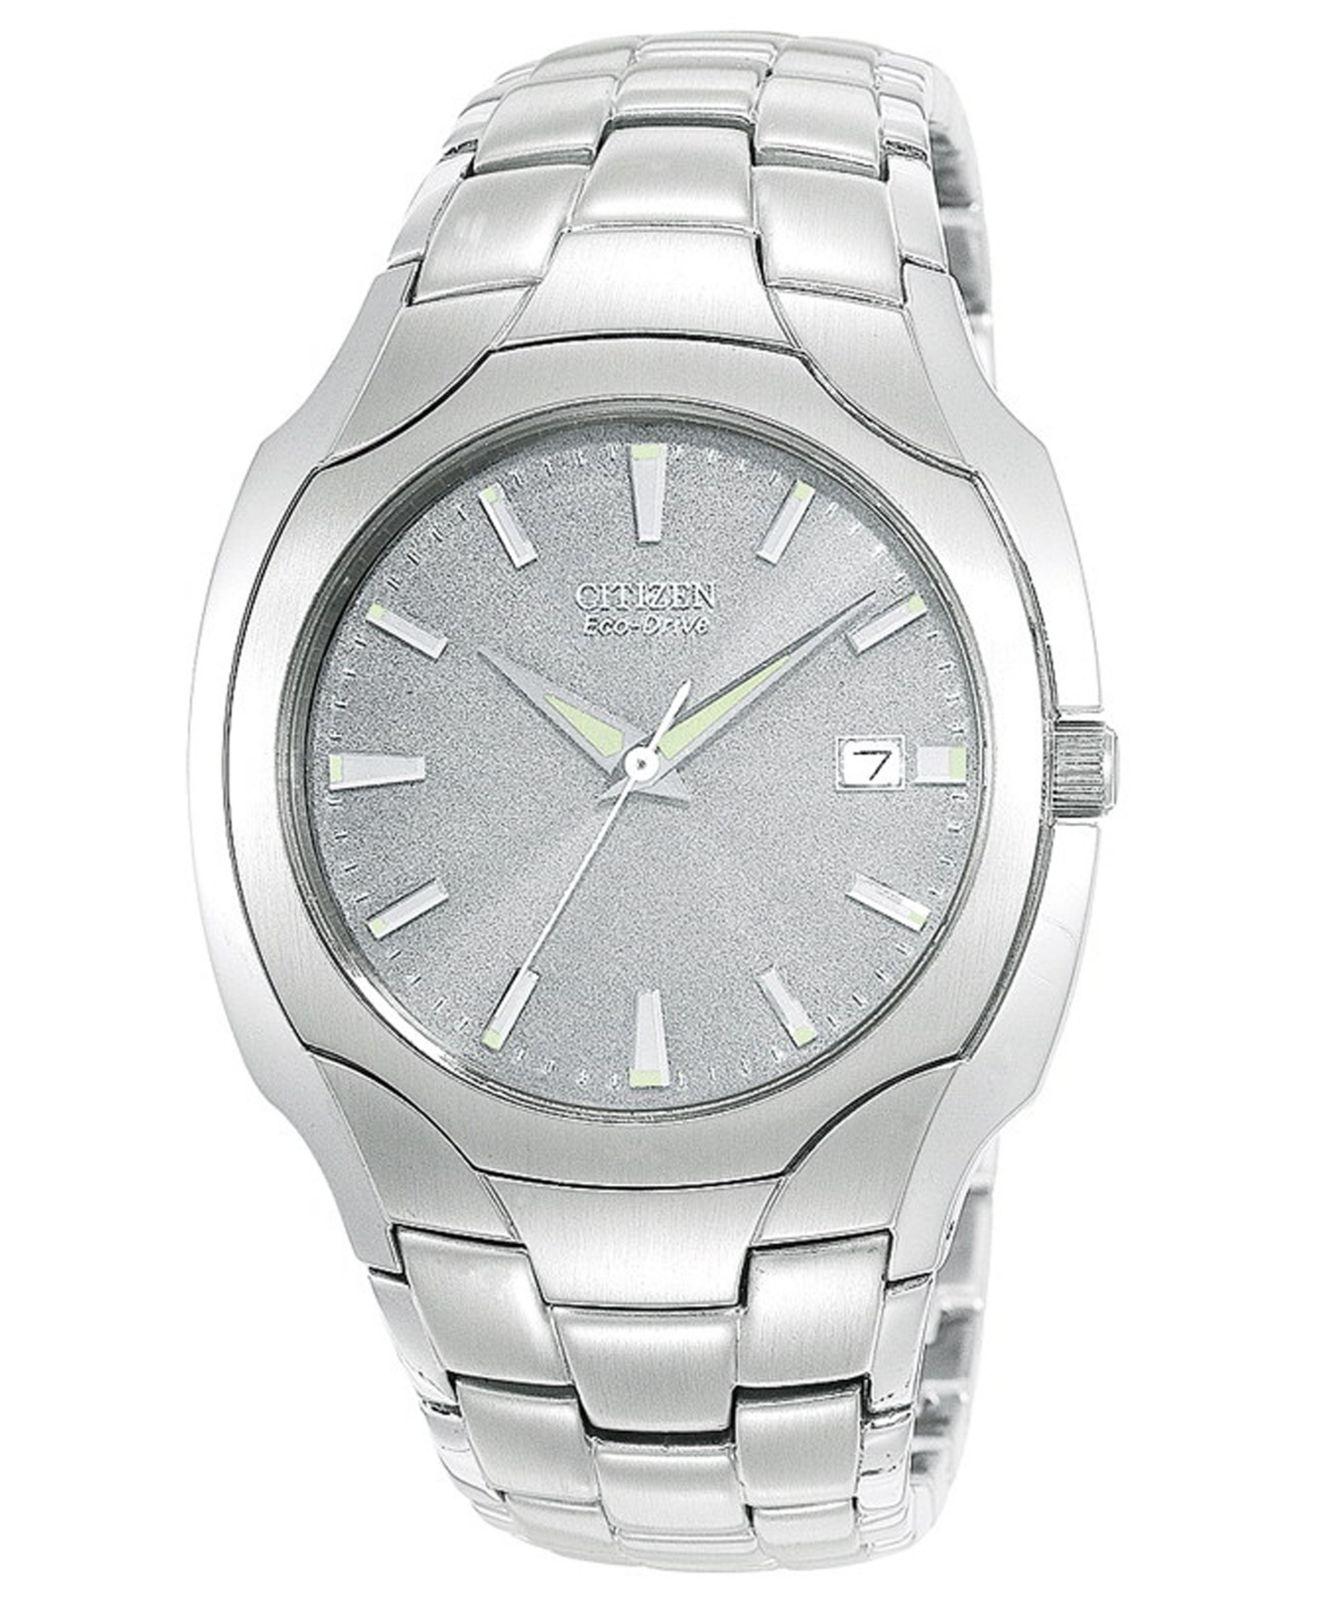 Citizen Men's Eco-drive Stainless Steel Bracelet Watch ...